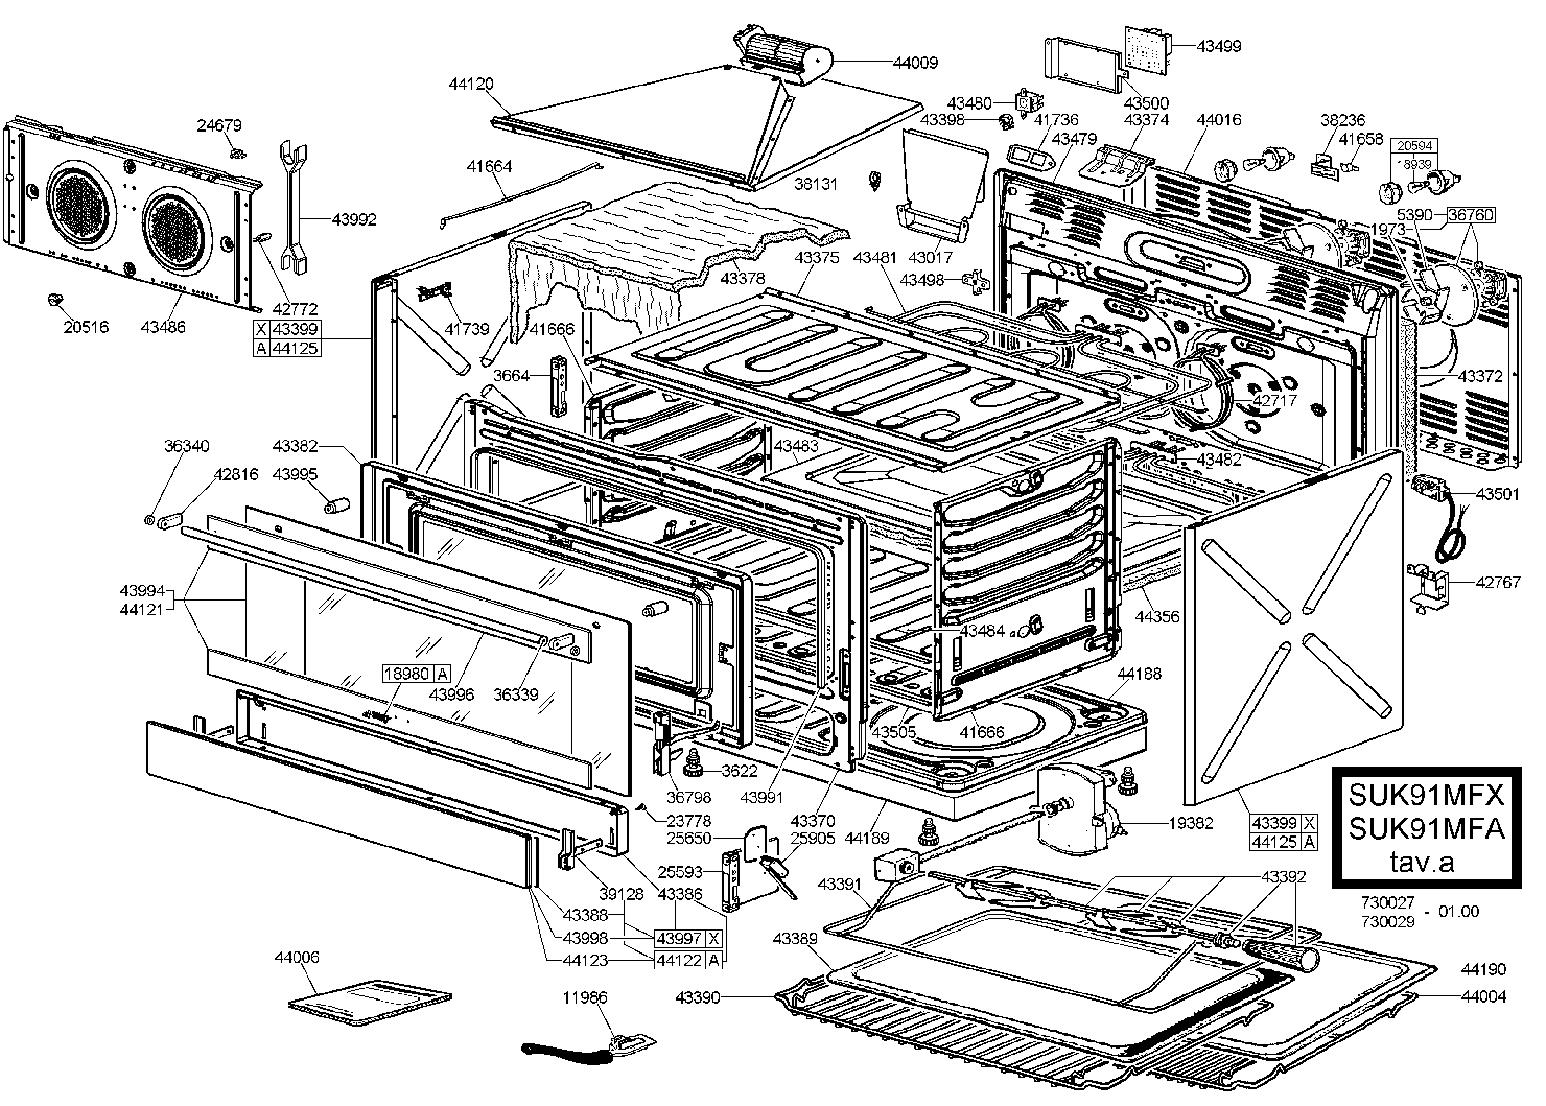 smeg suk91mfx cooker oven parts partmaster rh partmaster co uk GE Oven Wiring Diagram 240V Oven Wiring Diagram